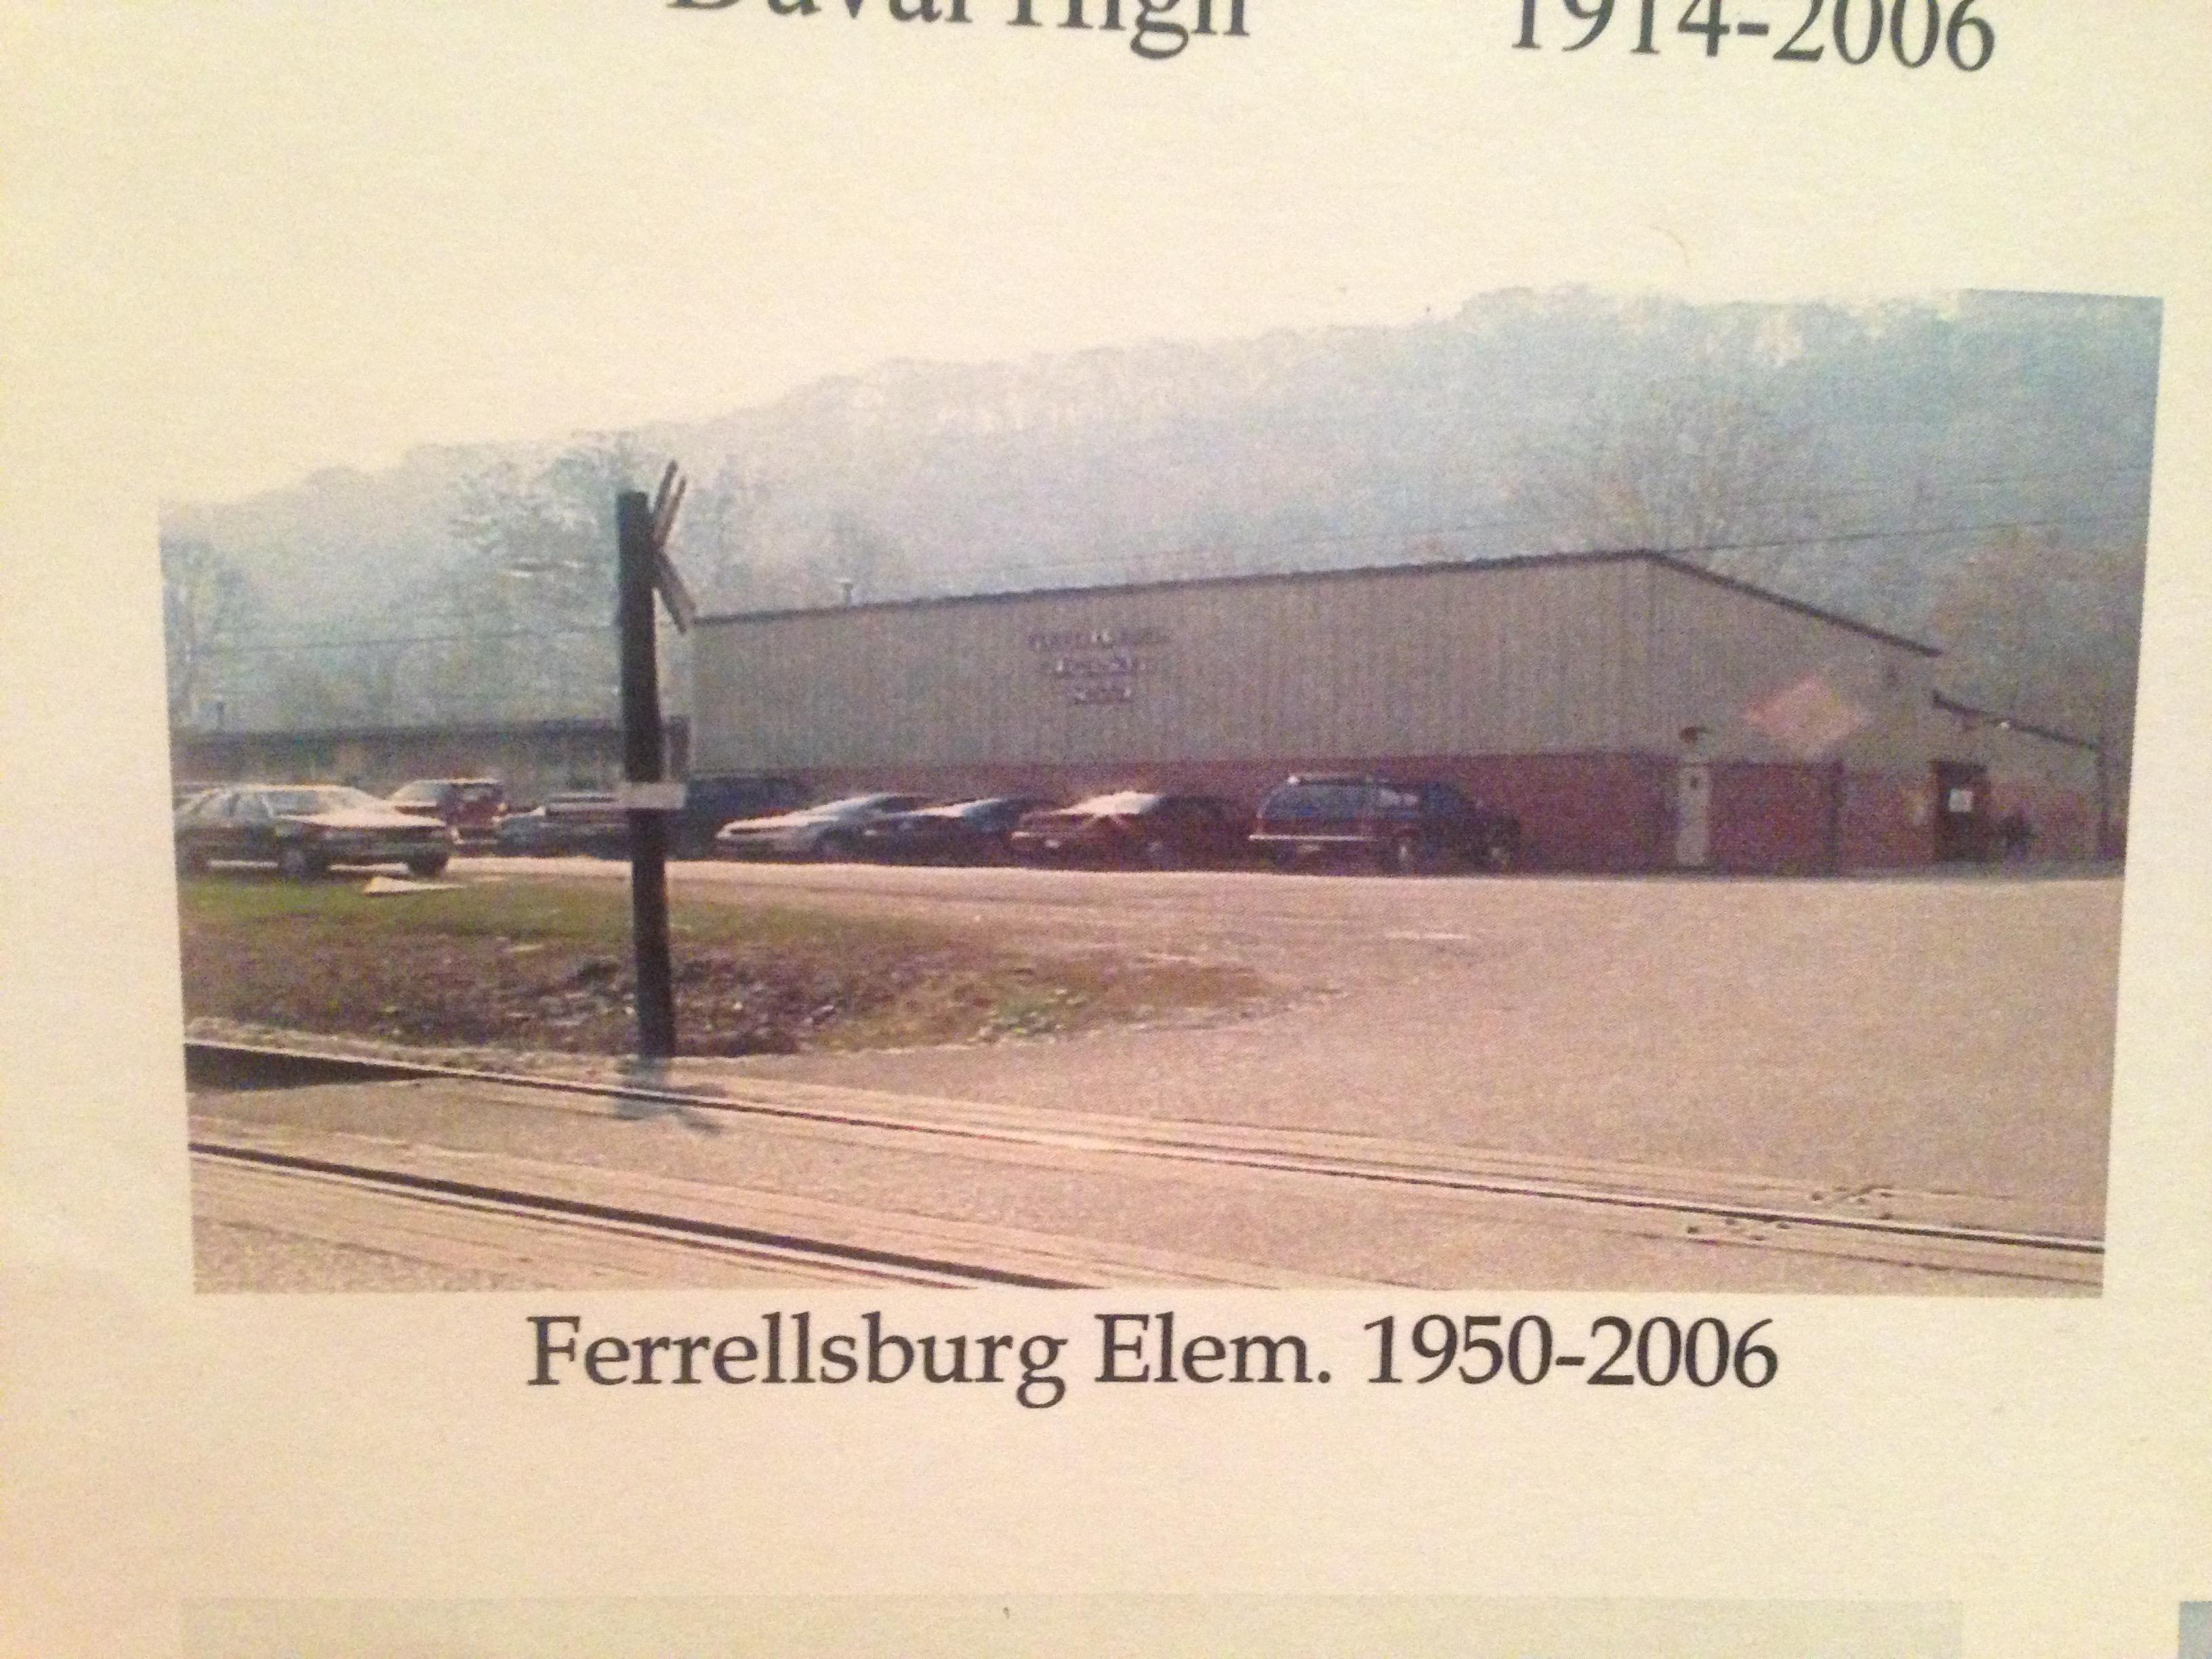 Ferrelsburg Elementary